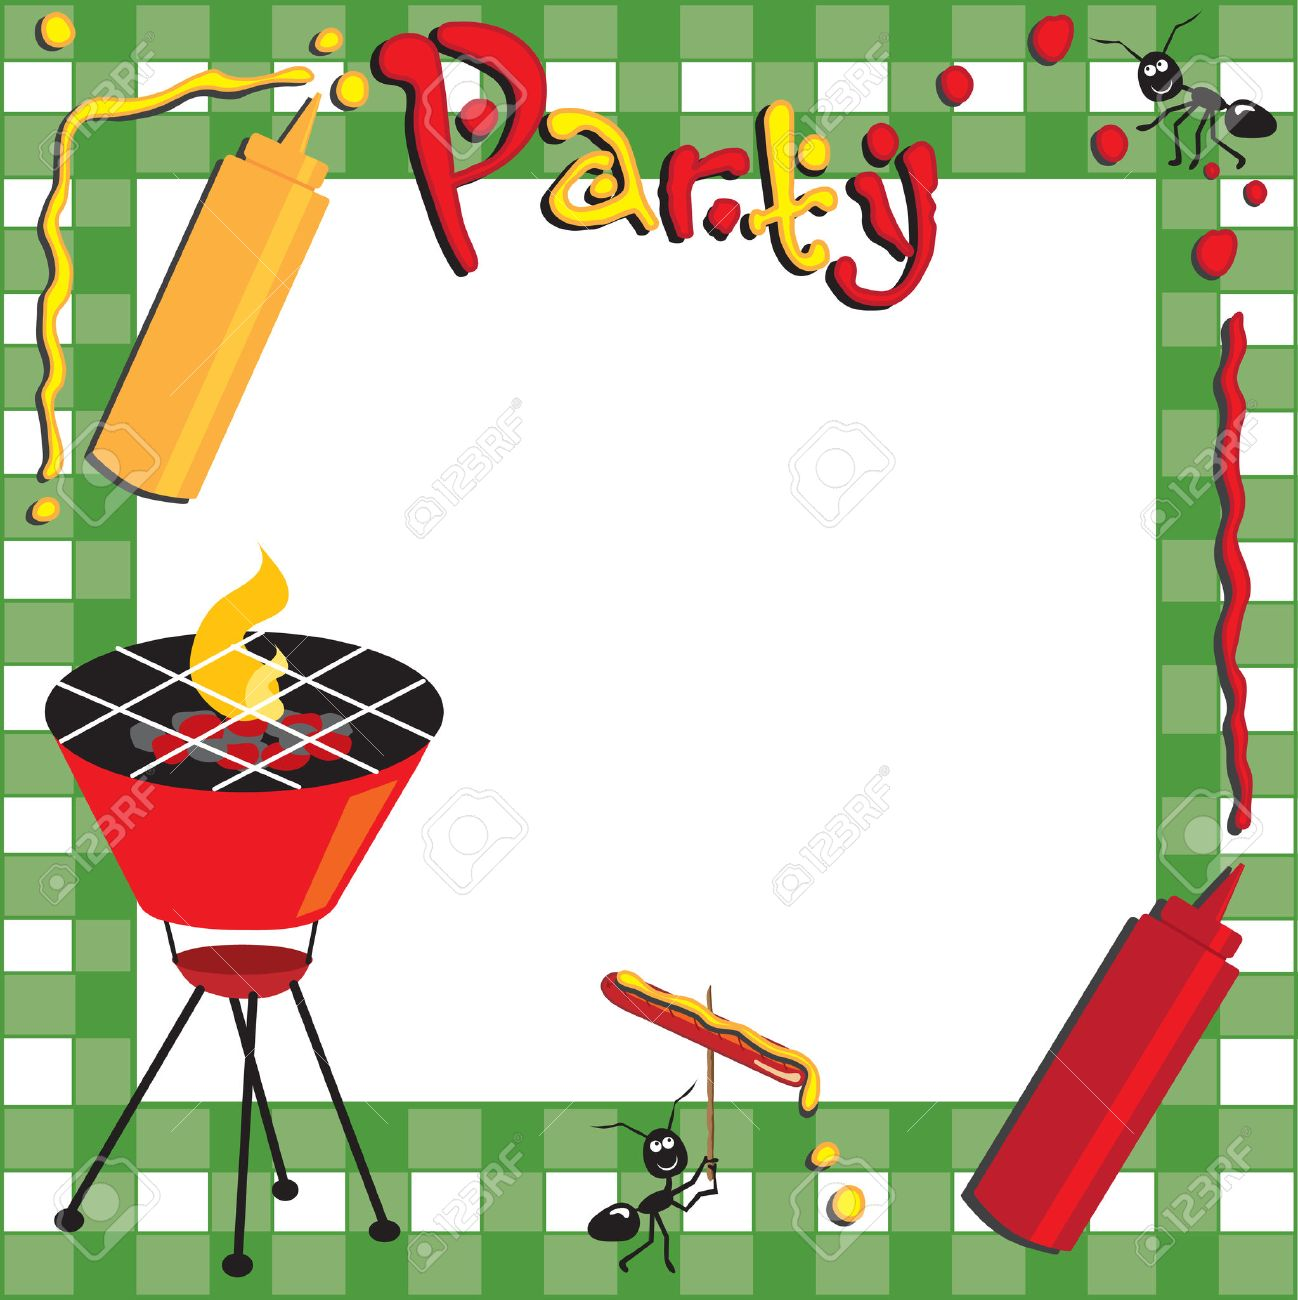 picnic and bbq invitation royalty free cliparts vectors and